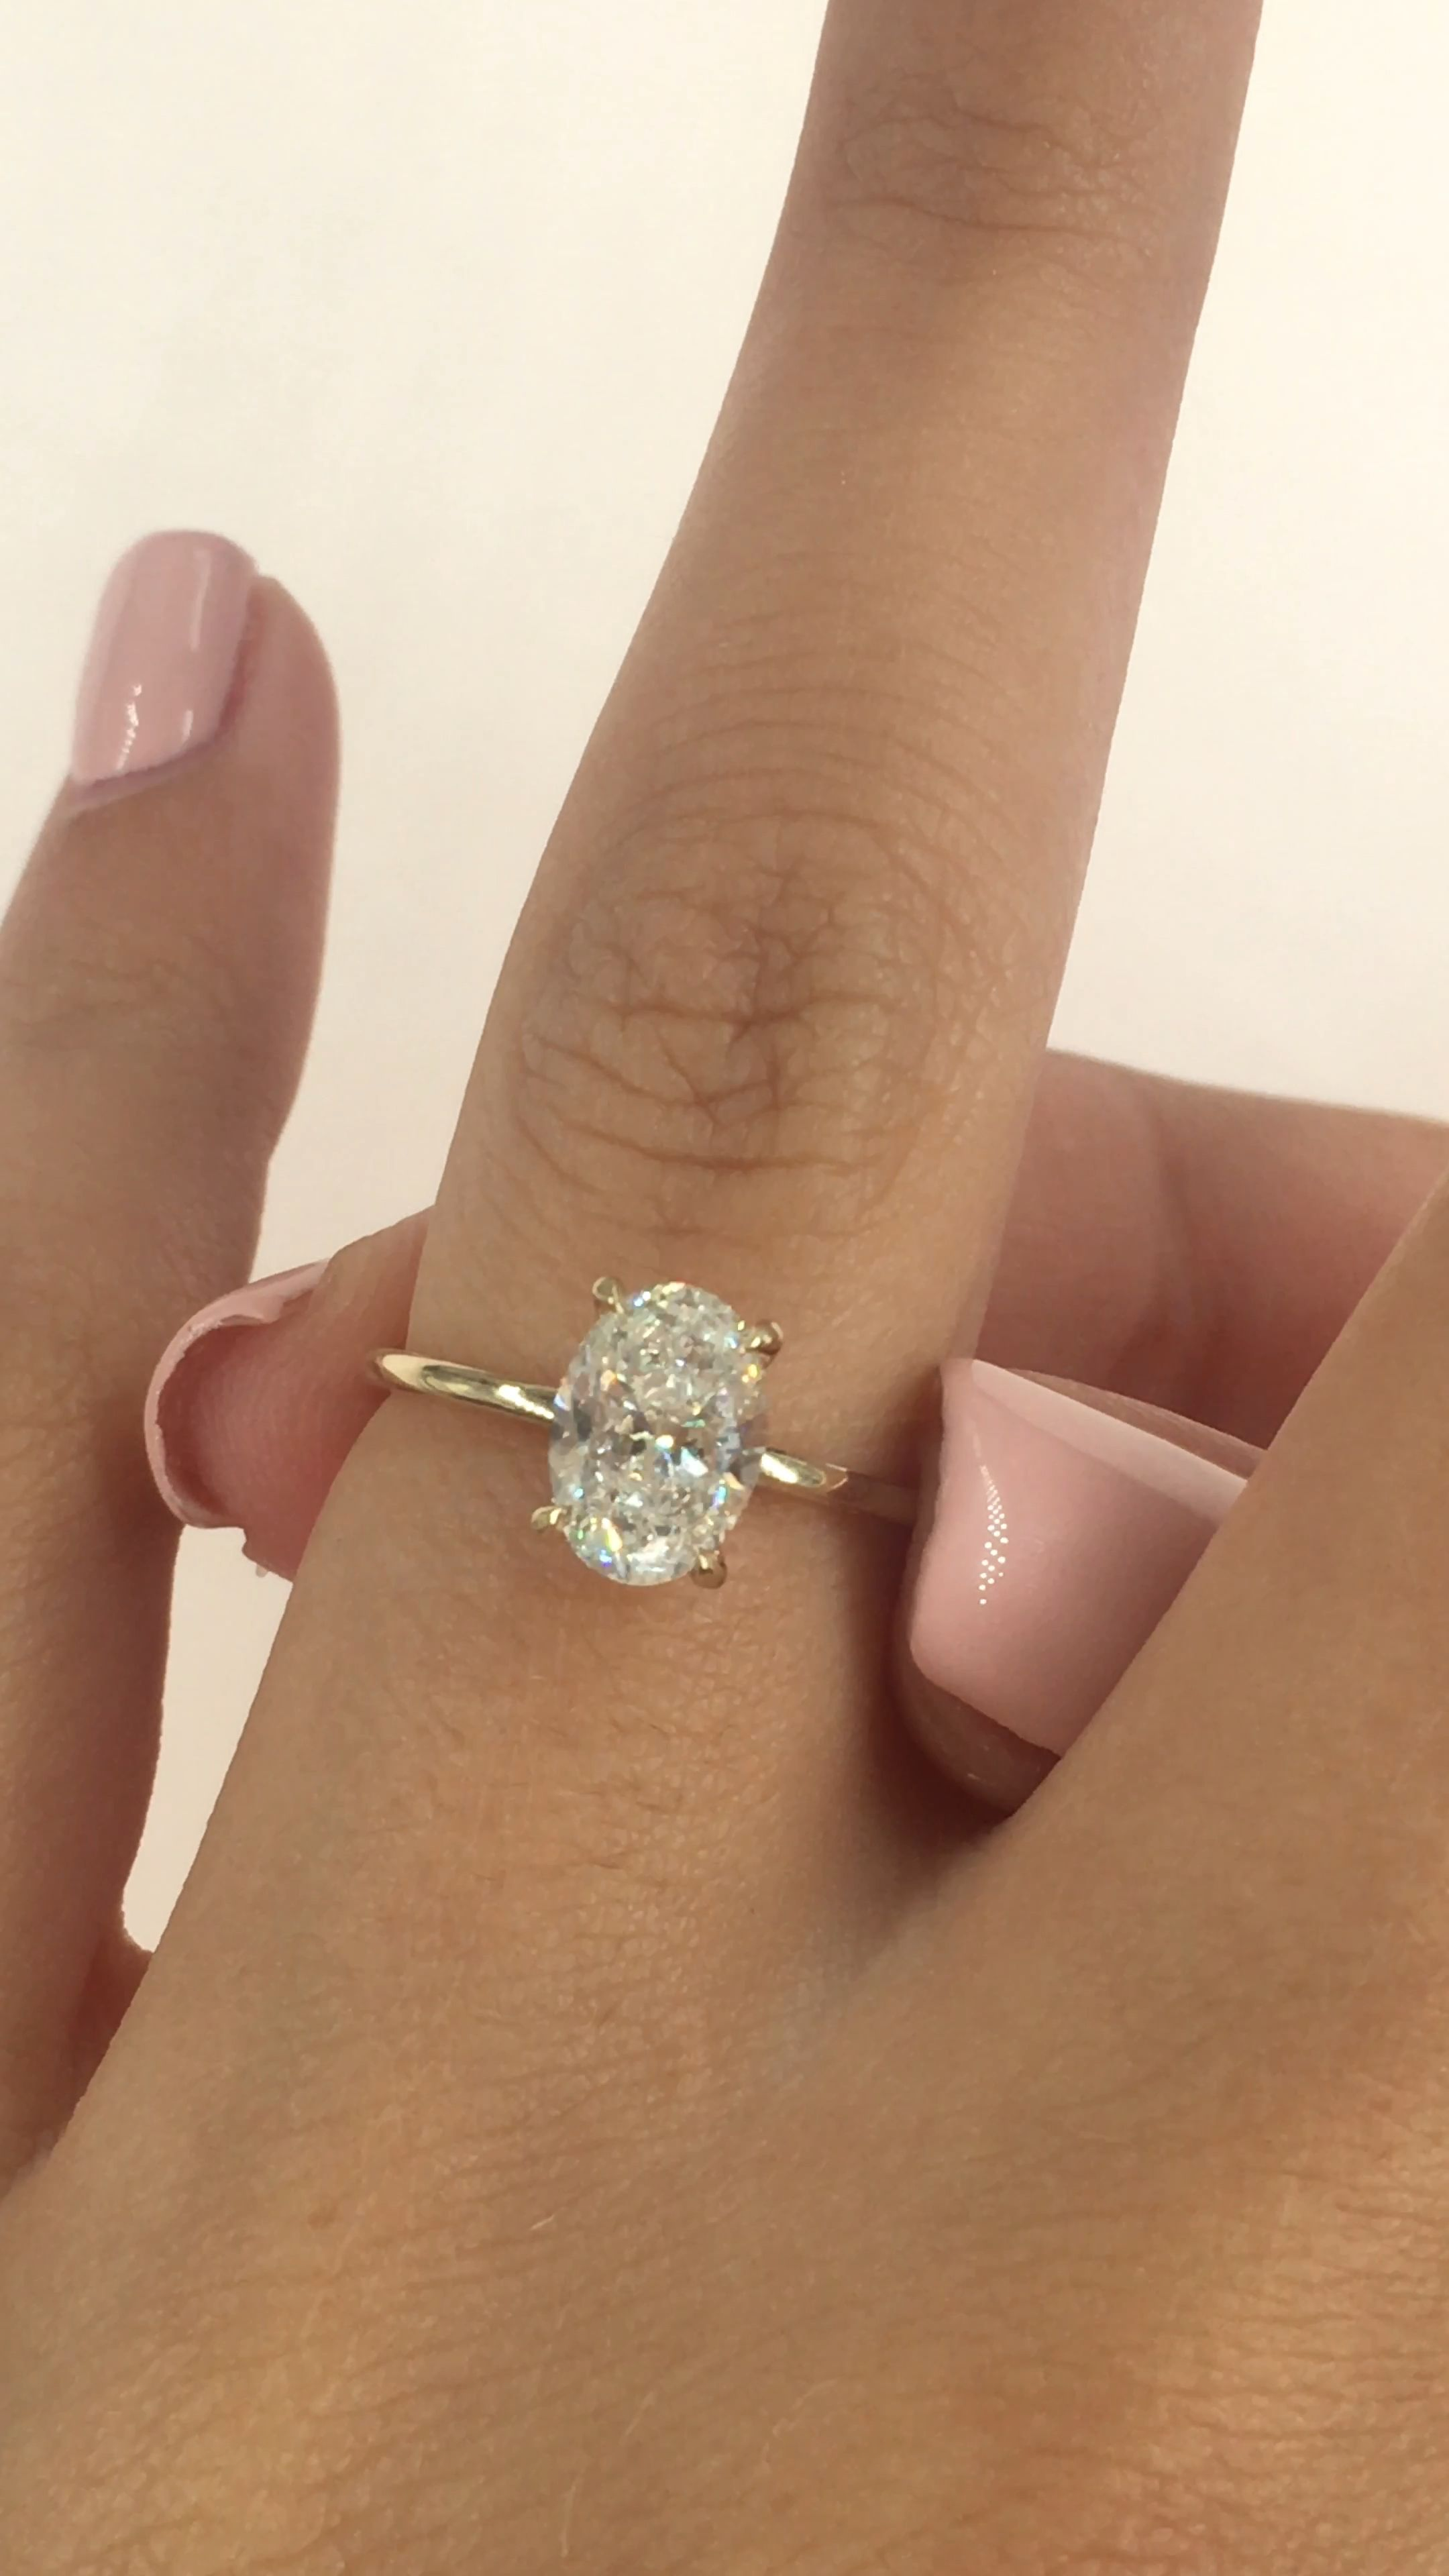 1 Carat Oval Diamond Engagement Ring Hidden Halo 14k Yellow | Etsy